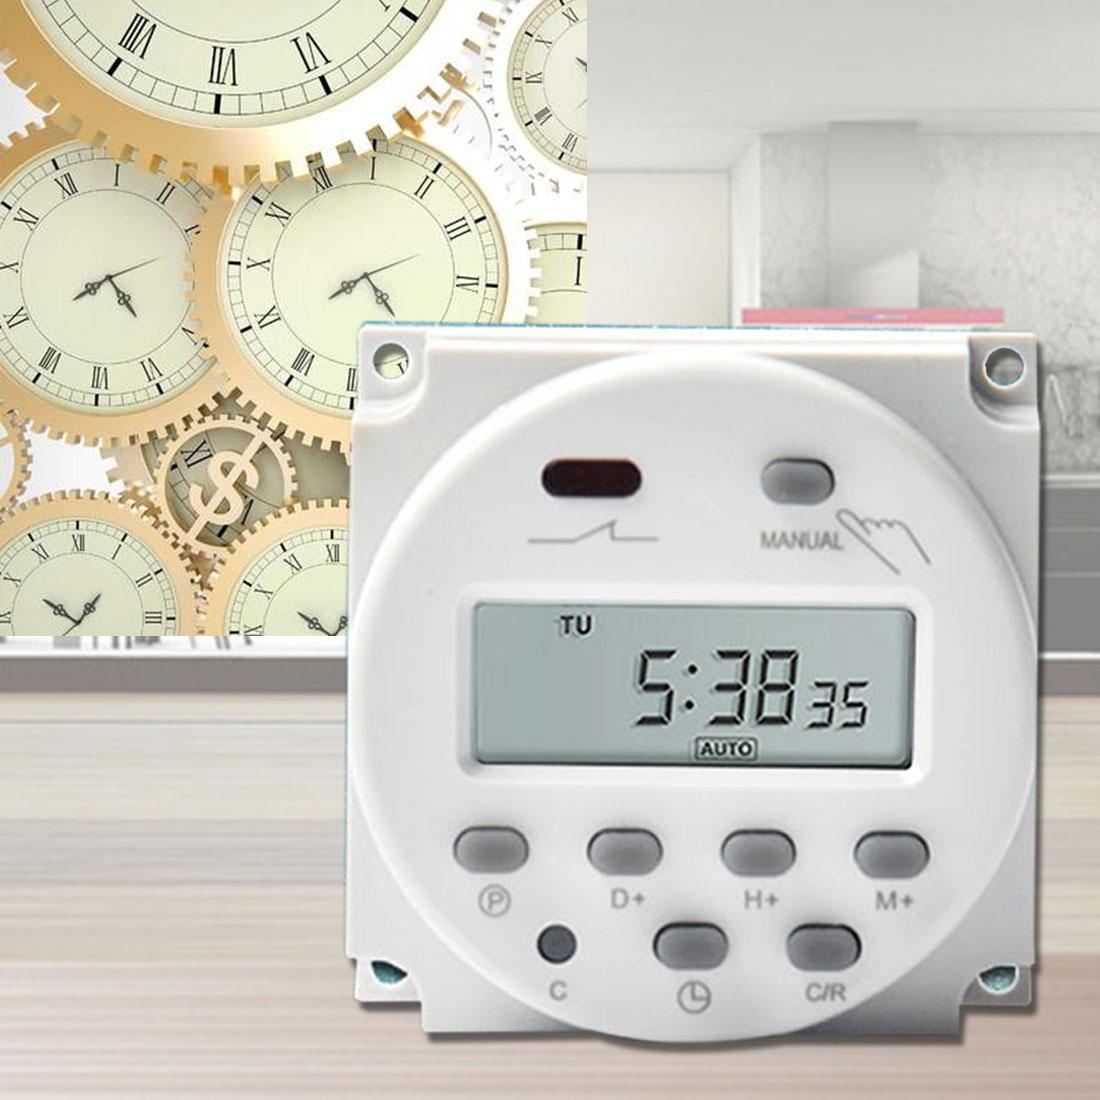 AC 220 v Digitale Runde LCD Energien-programmierbares Timer Zeit Relais 16A Schalter Unterstützung